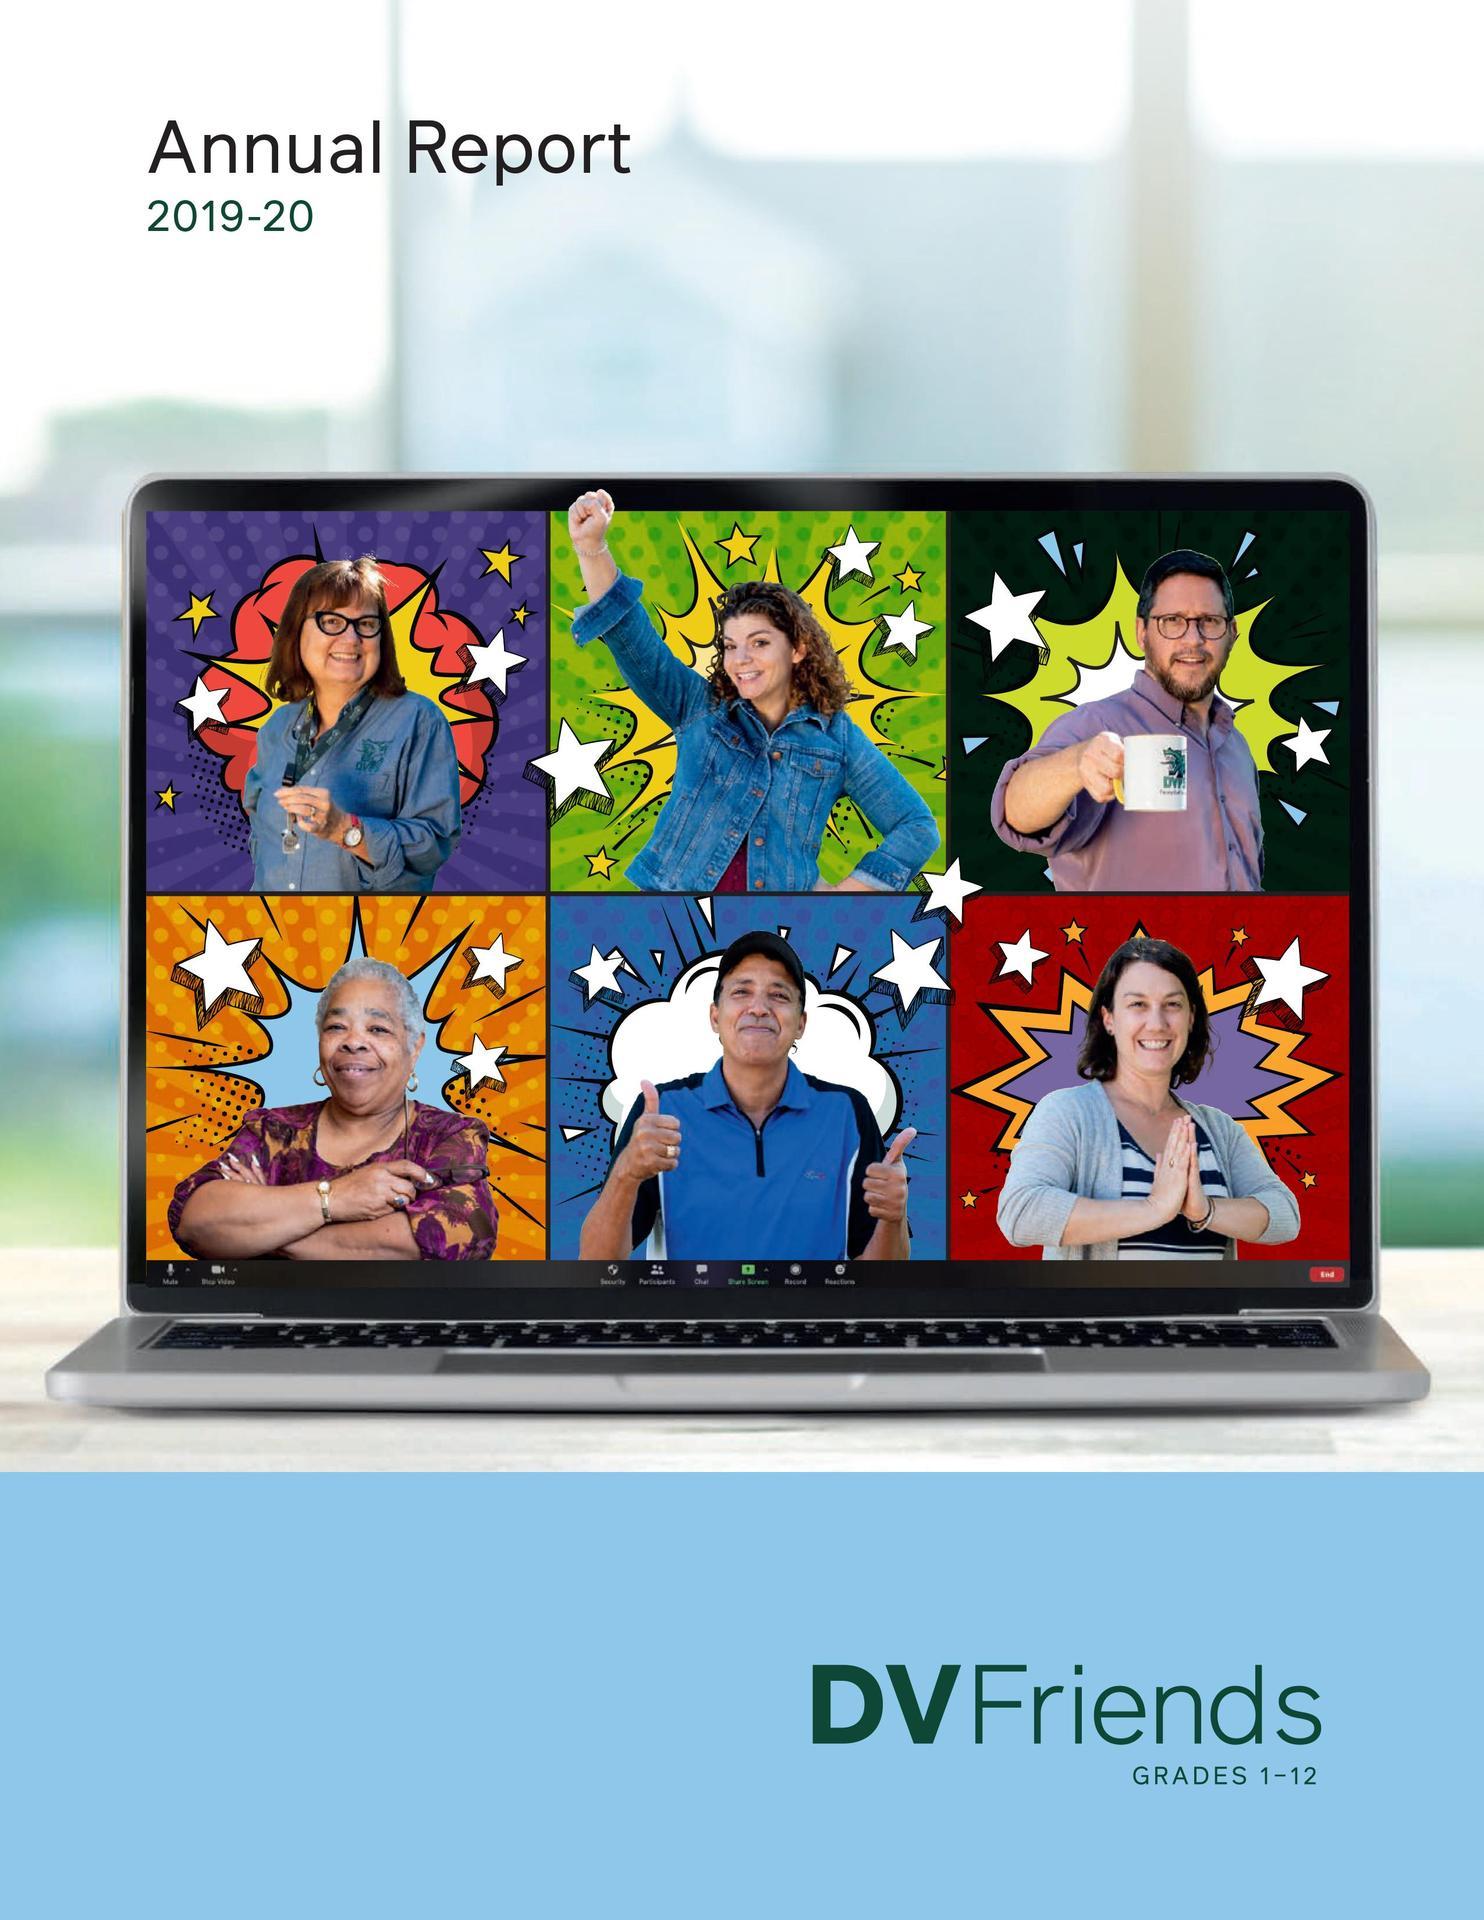 DVFS Annual Report 2019-20